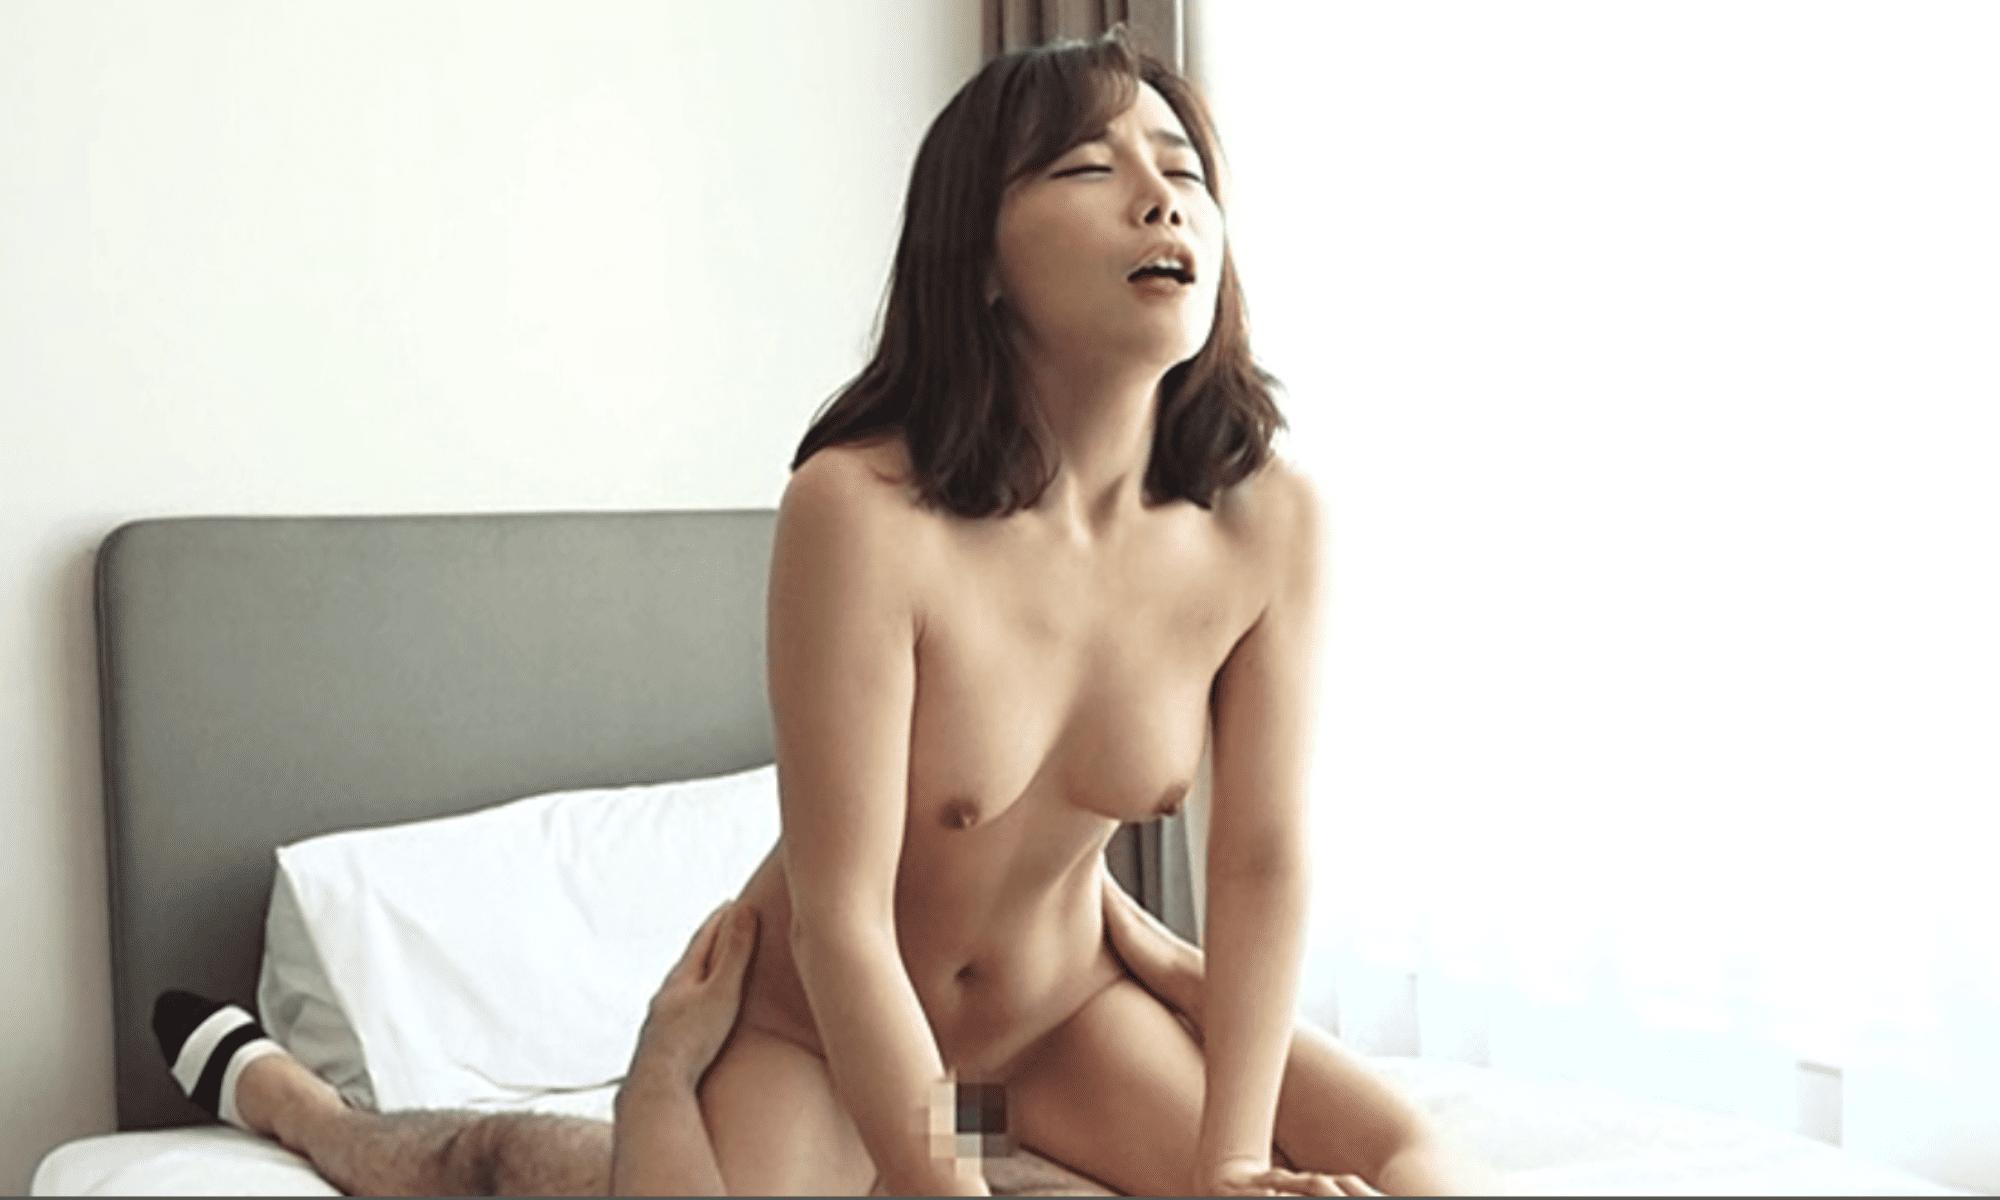 Black celebrity nude pics